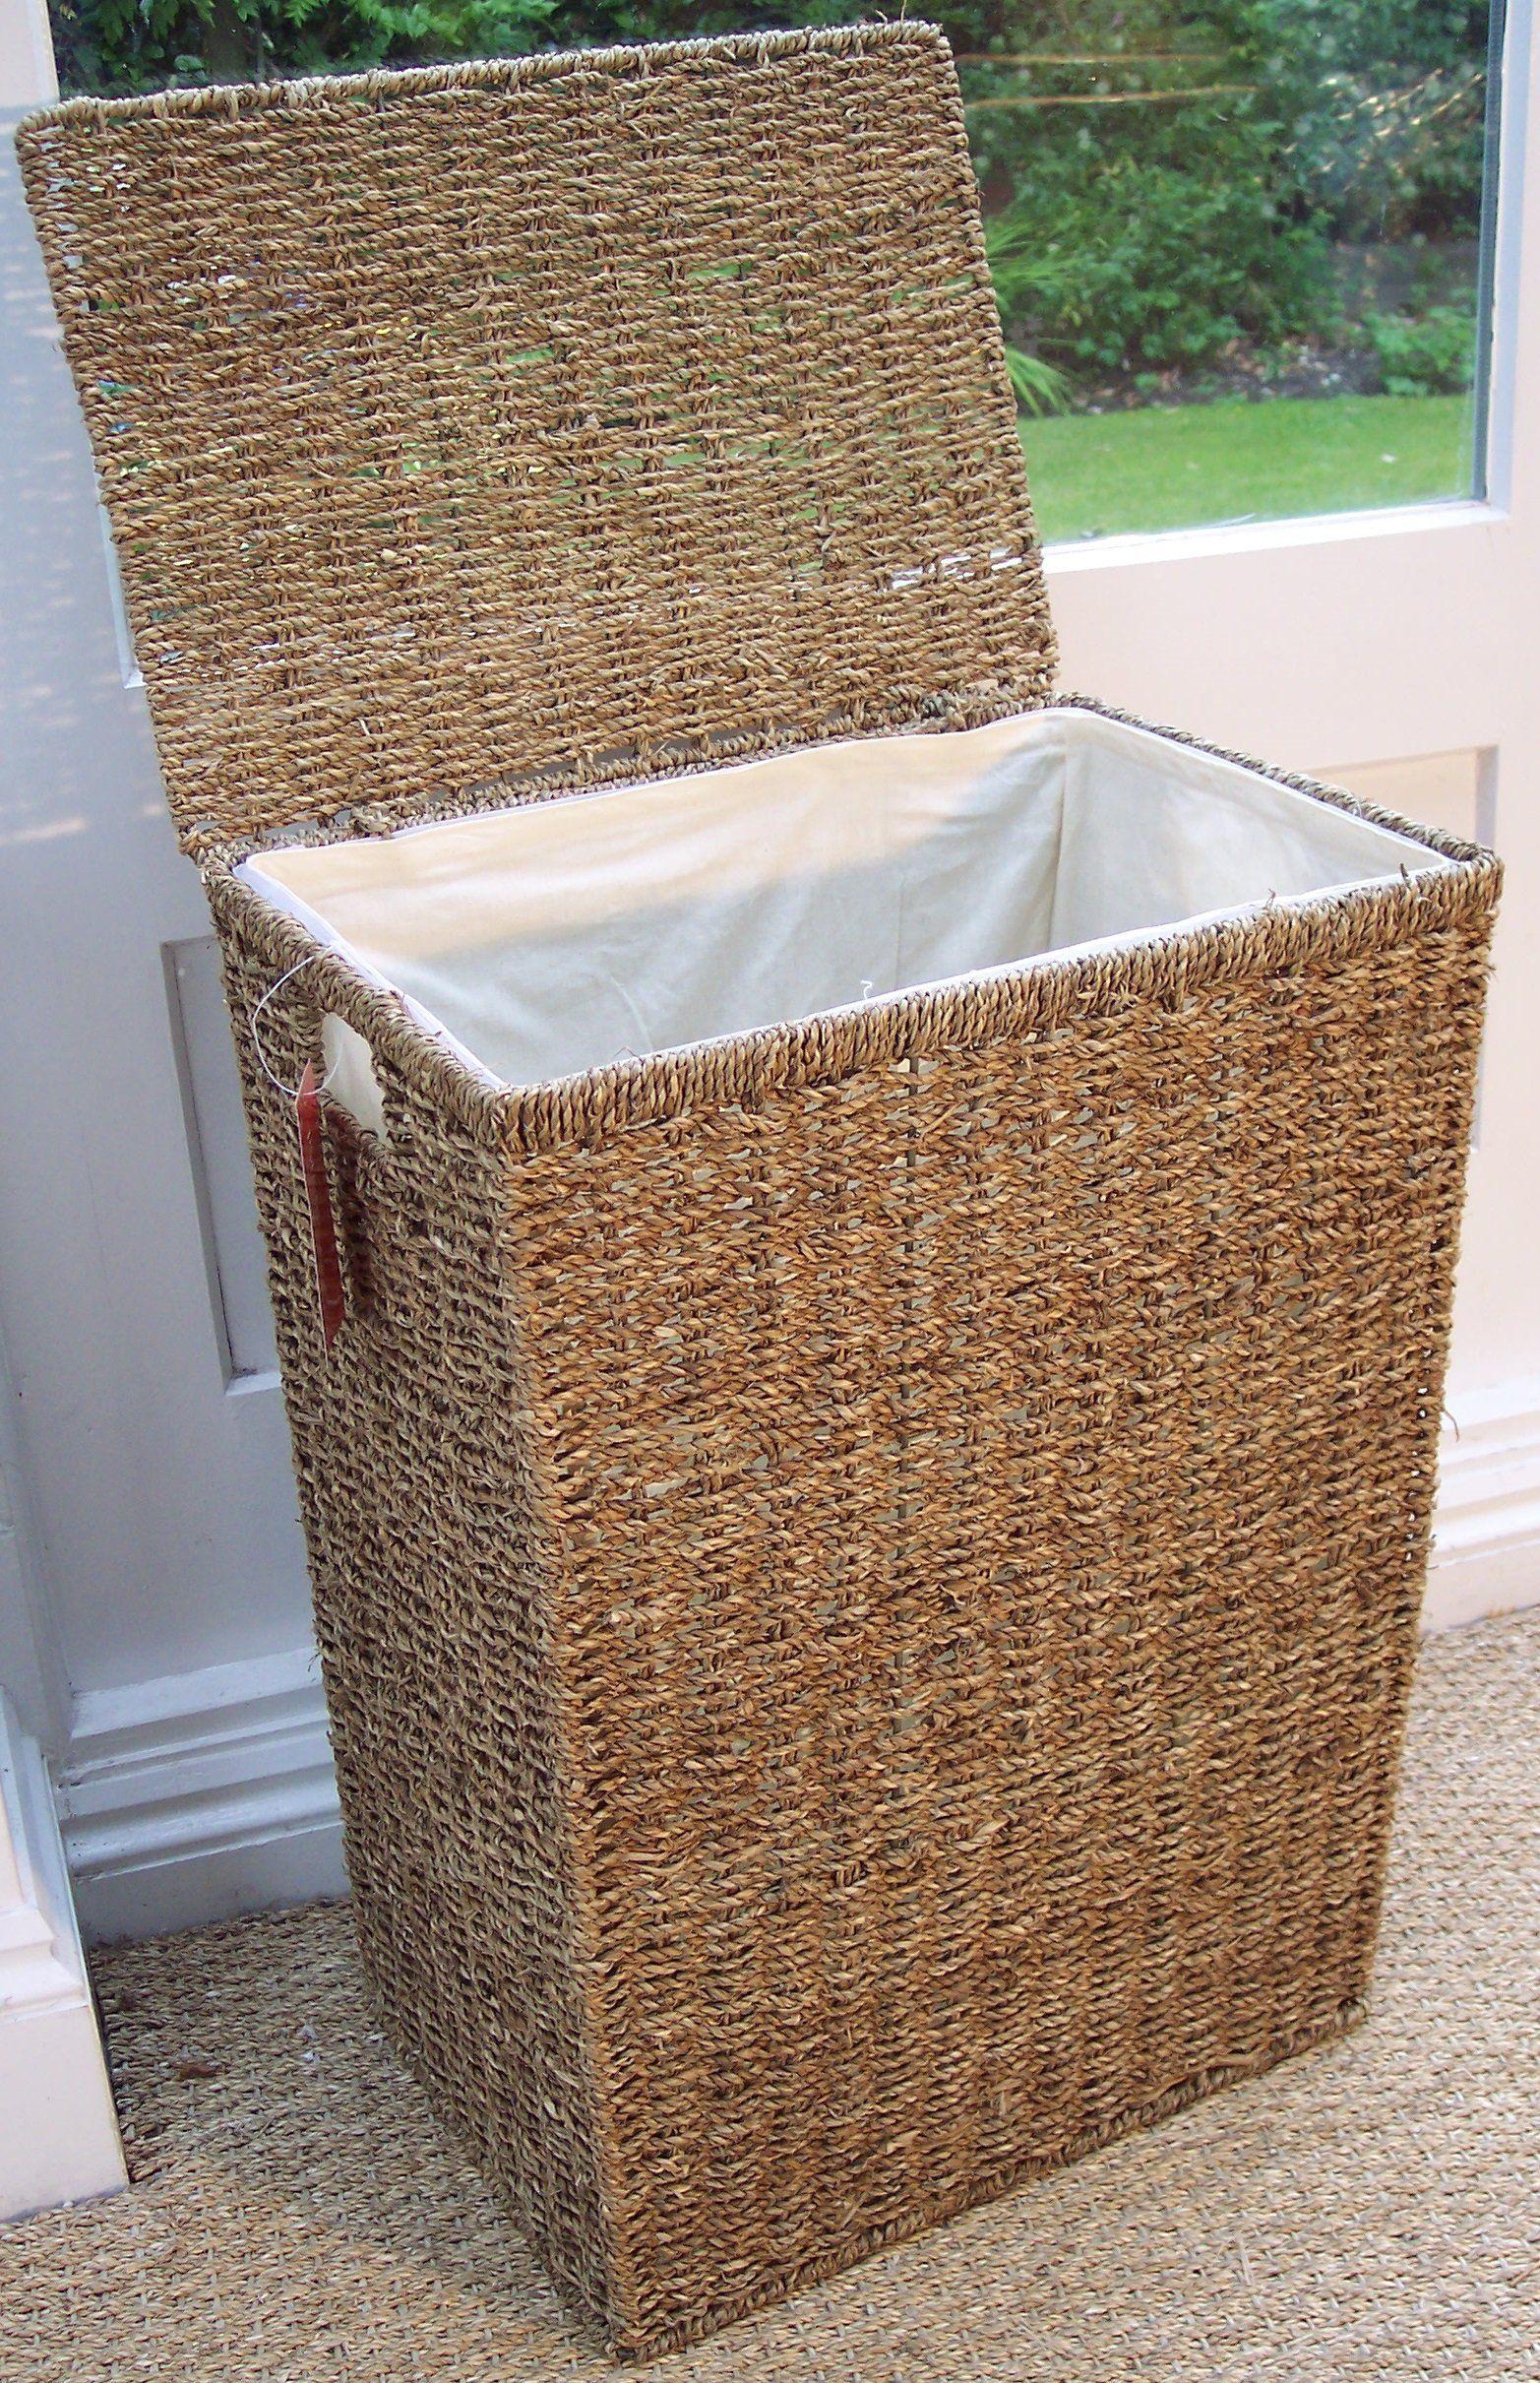 Decorative Laundry Hamper Sea Grass Laundry Hamper With Lid Uk59Cm X 40Cm X 28 Cm